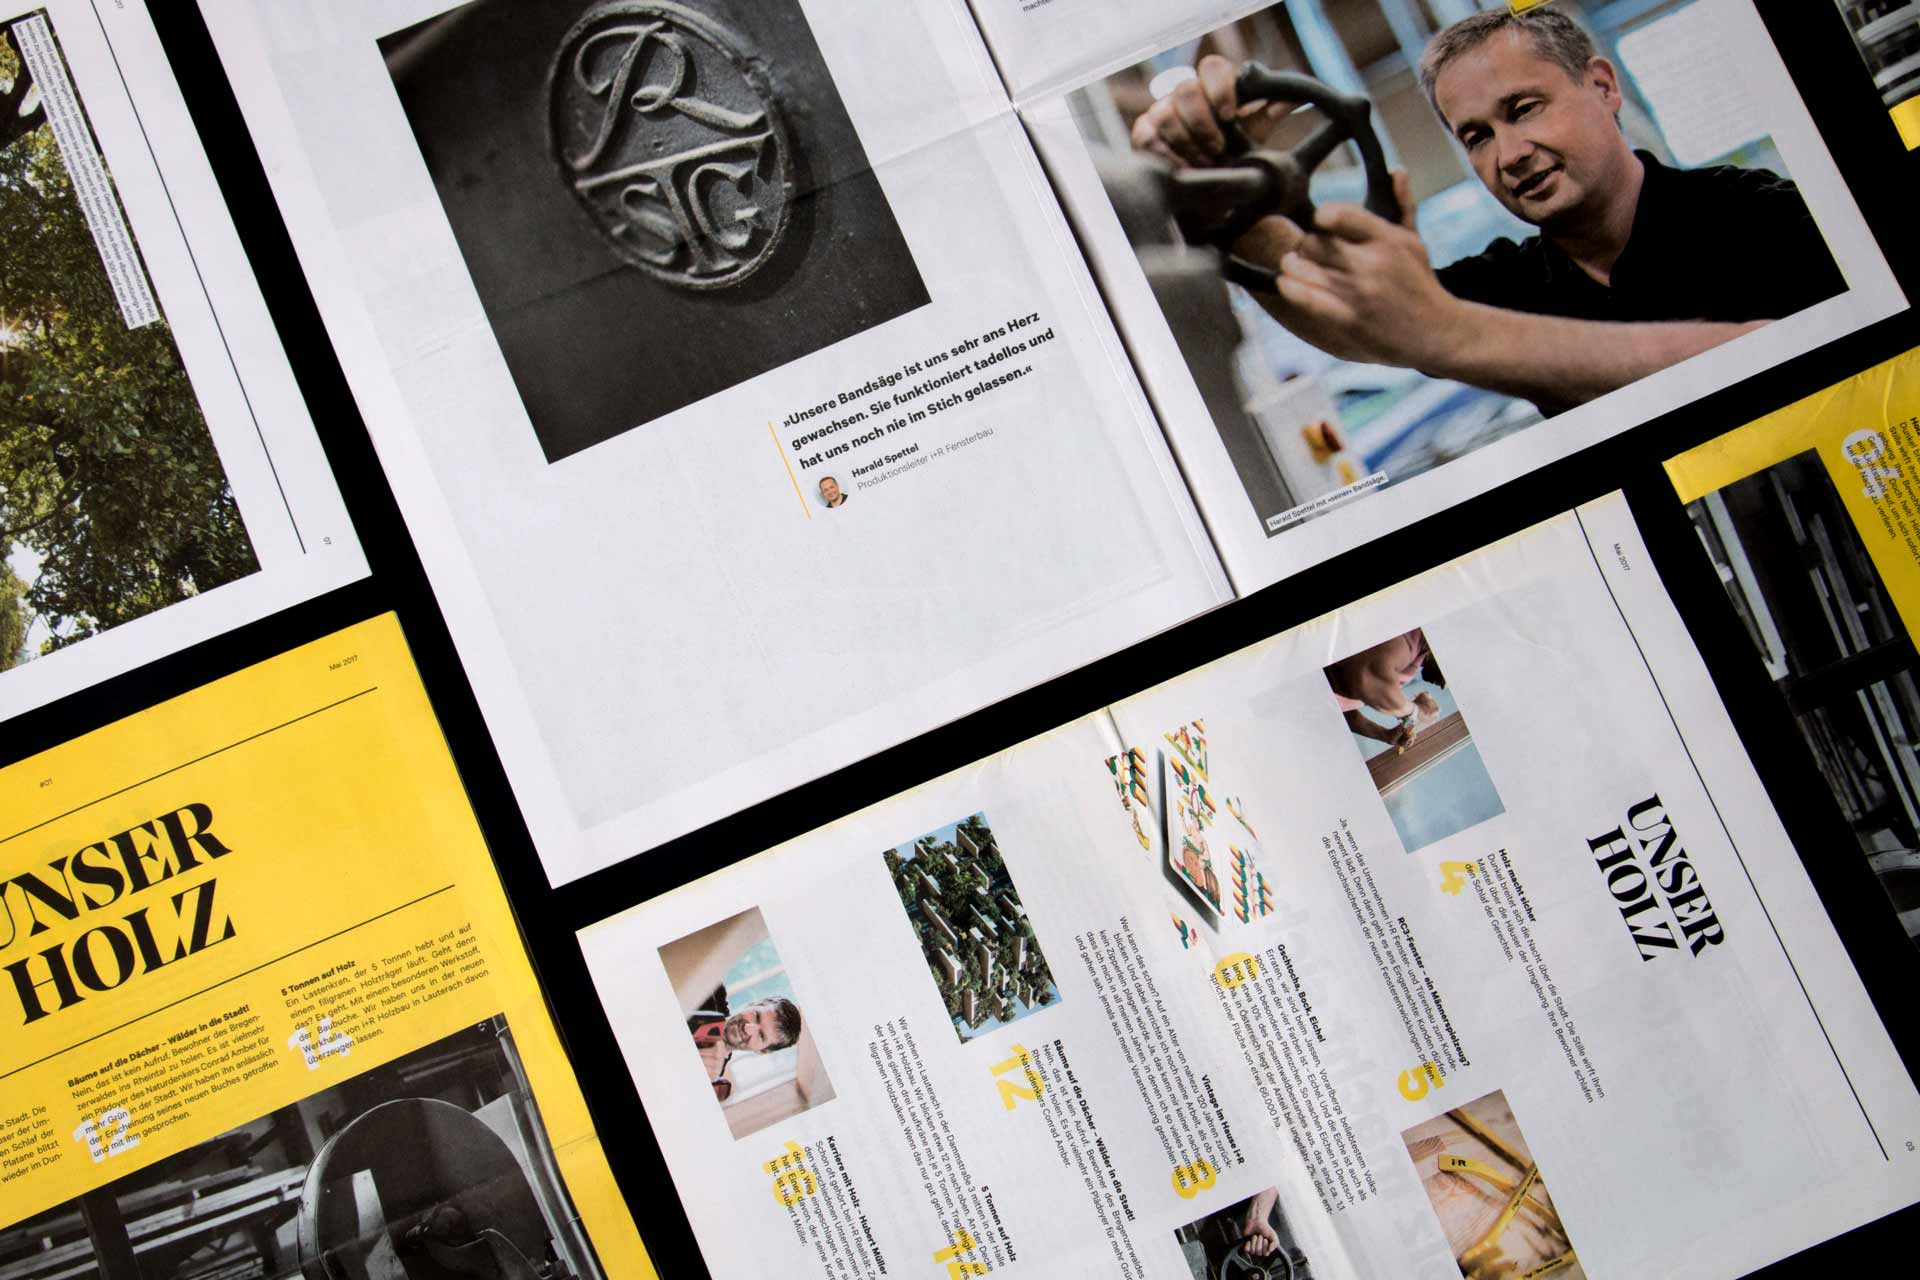 Unser Holz, i+R, Zeitung, Website, Storytelling, Editorial Design, Webdesign, Bernhard Hafele